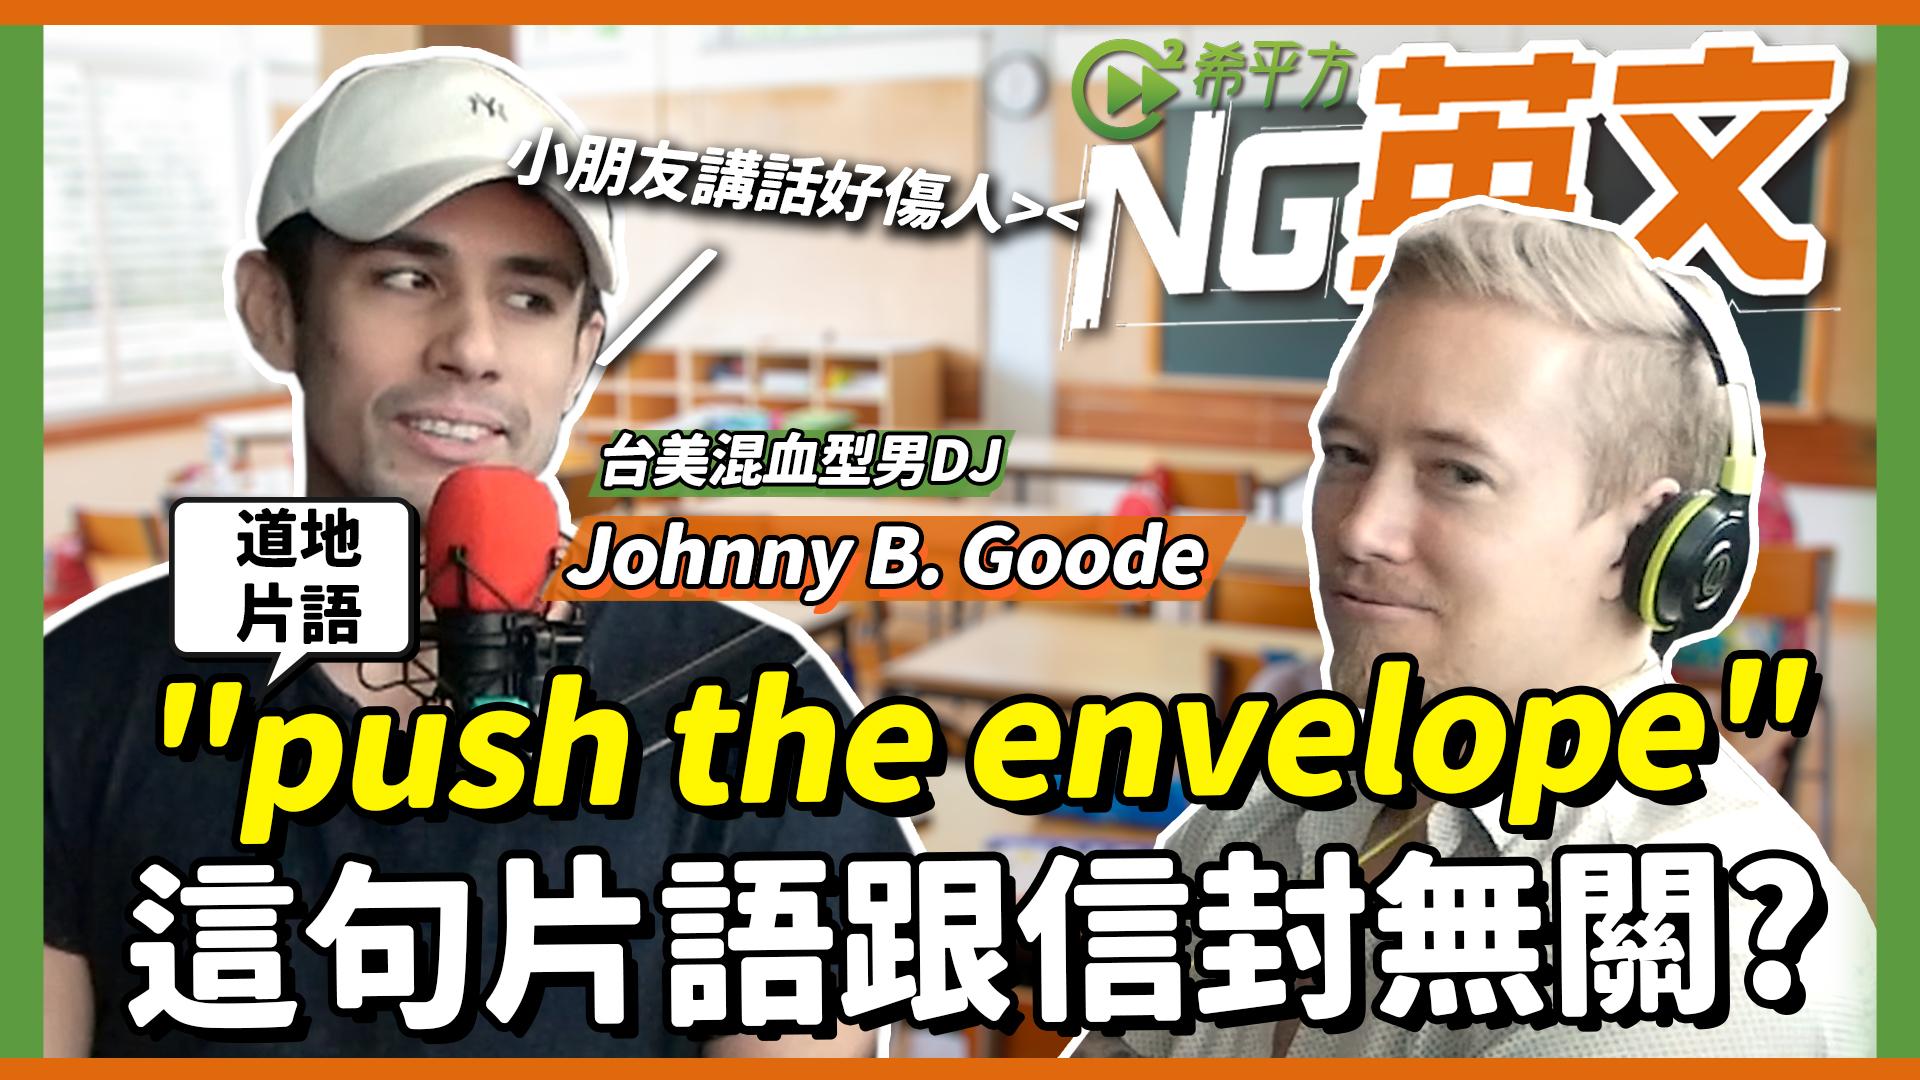 台美混血型男 DJ Johnny B. Goode: